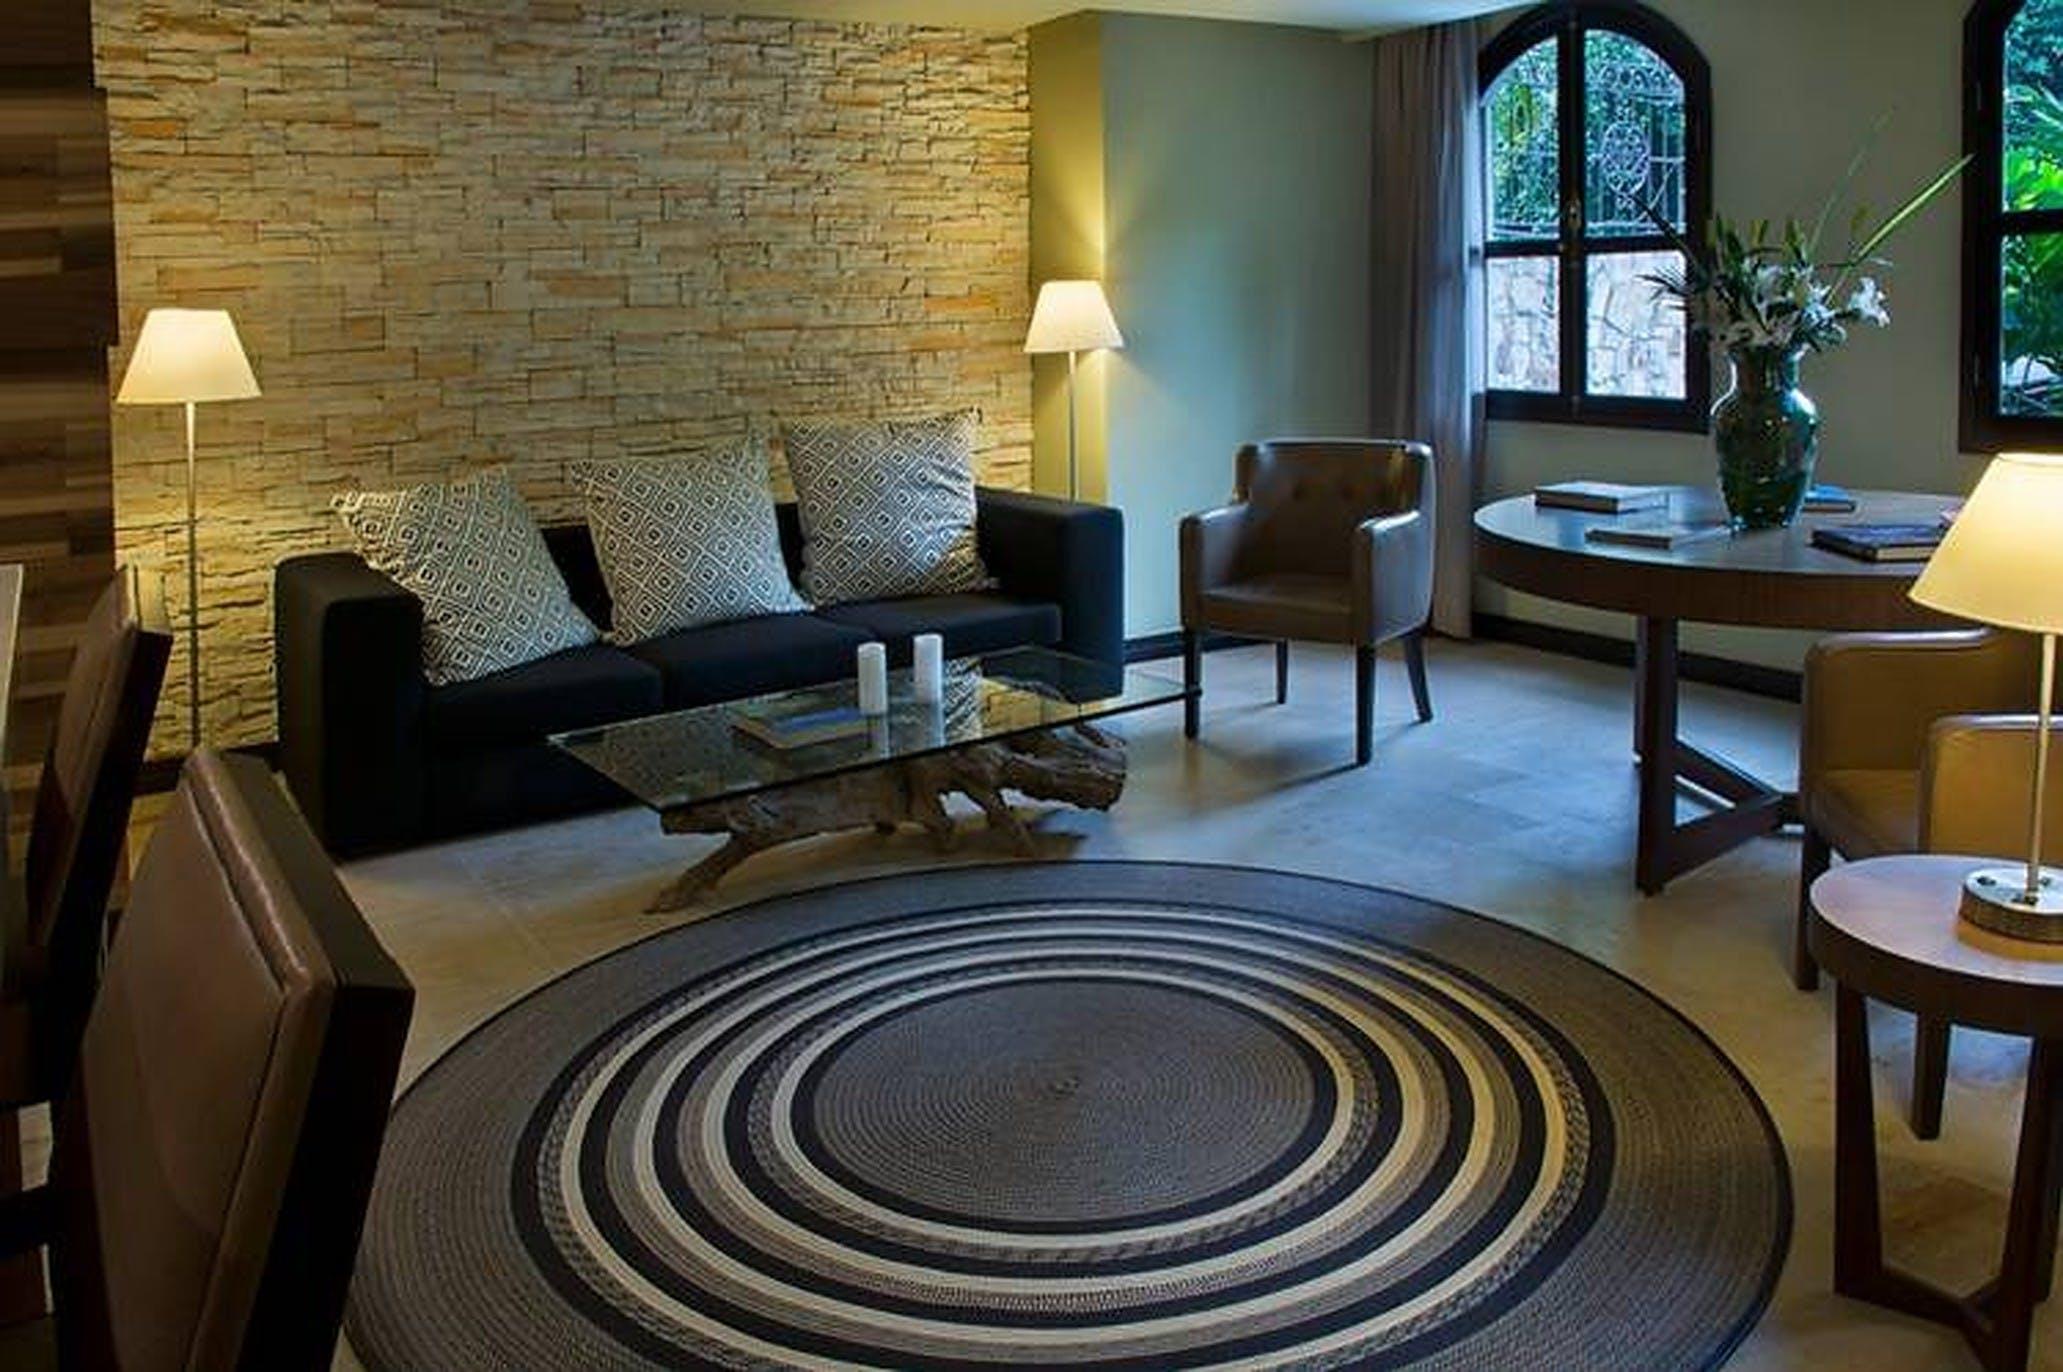 100 Residents   Barrio Granada   Classic Stylish Complex w/ Coworking + Sauna +  Lounge Areas